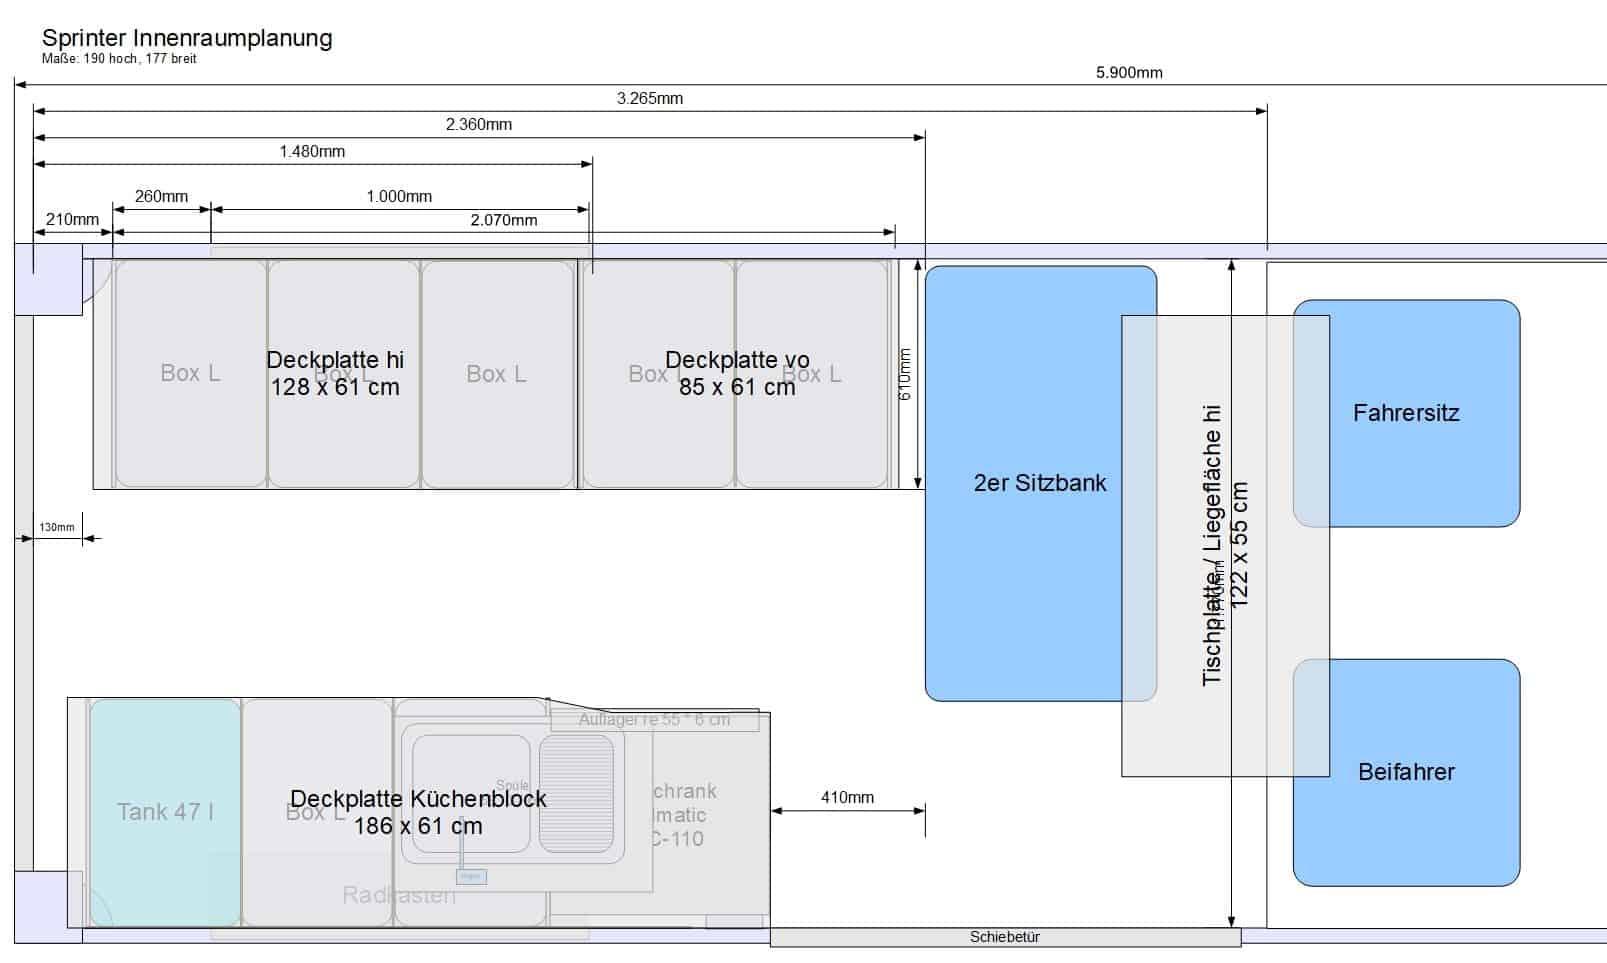 Wohnmobil selbstausbau Sprinter Grundriss